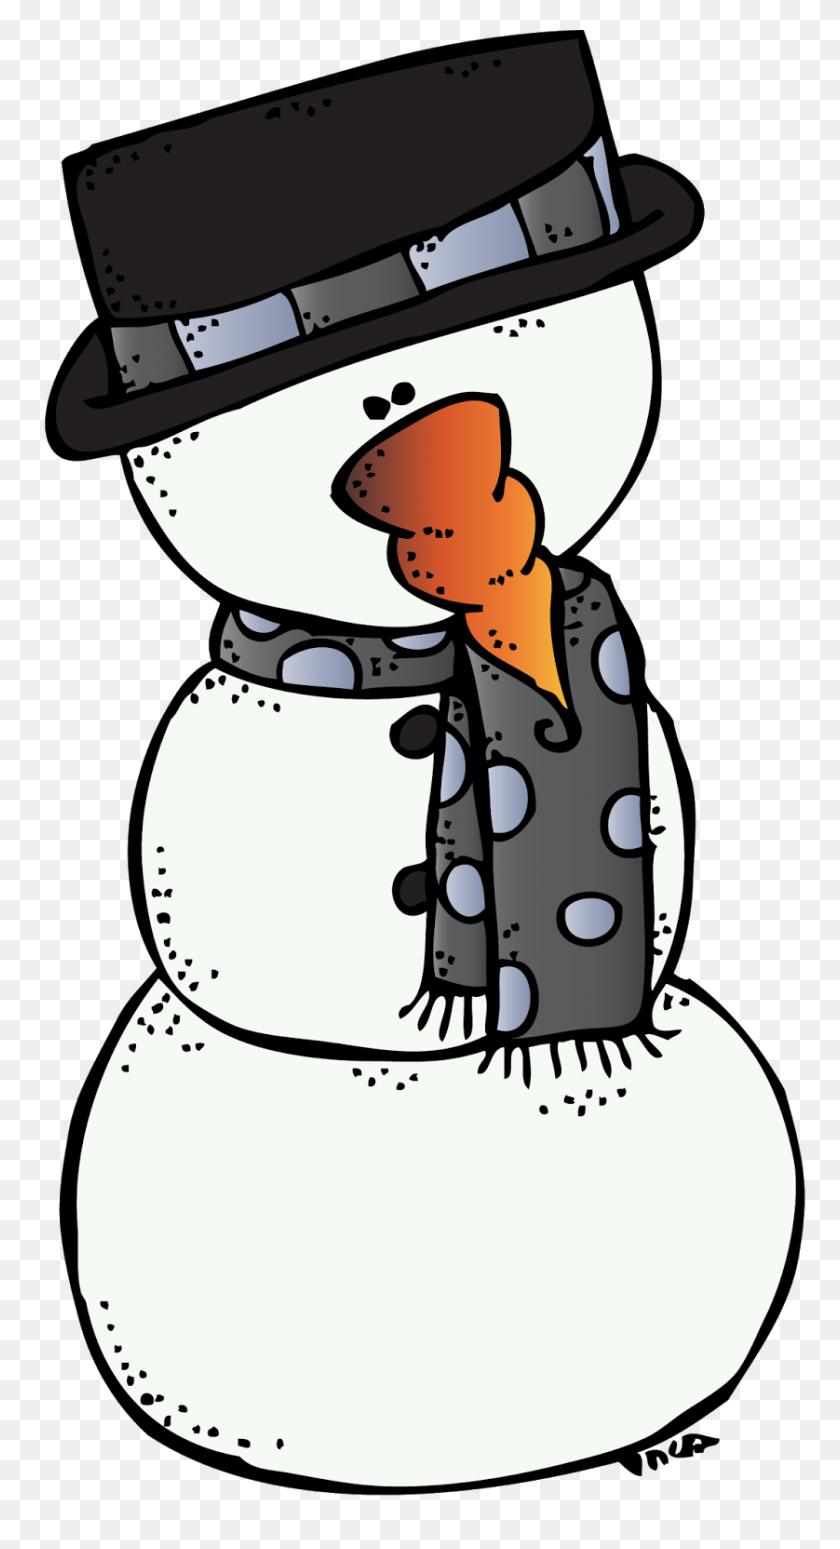 838x1600 Image Result For Melonheadz Snow Melonheadz - Melonheadz Christmas Clipart